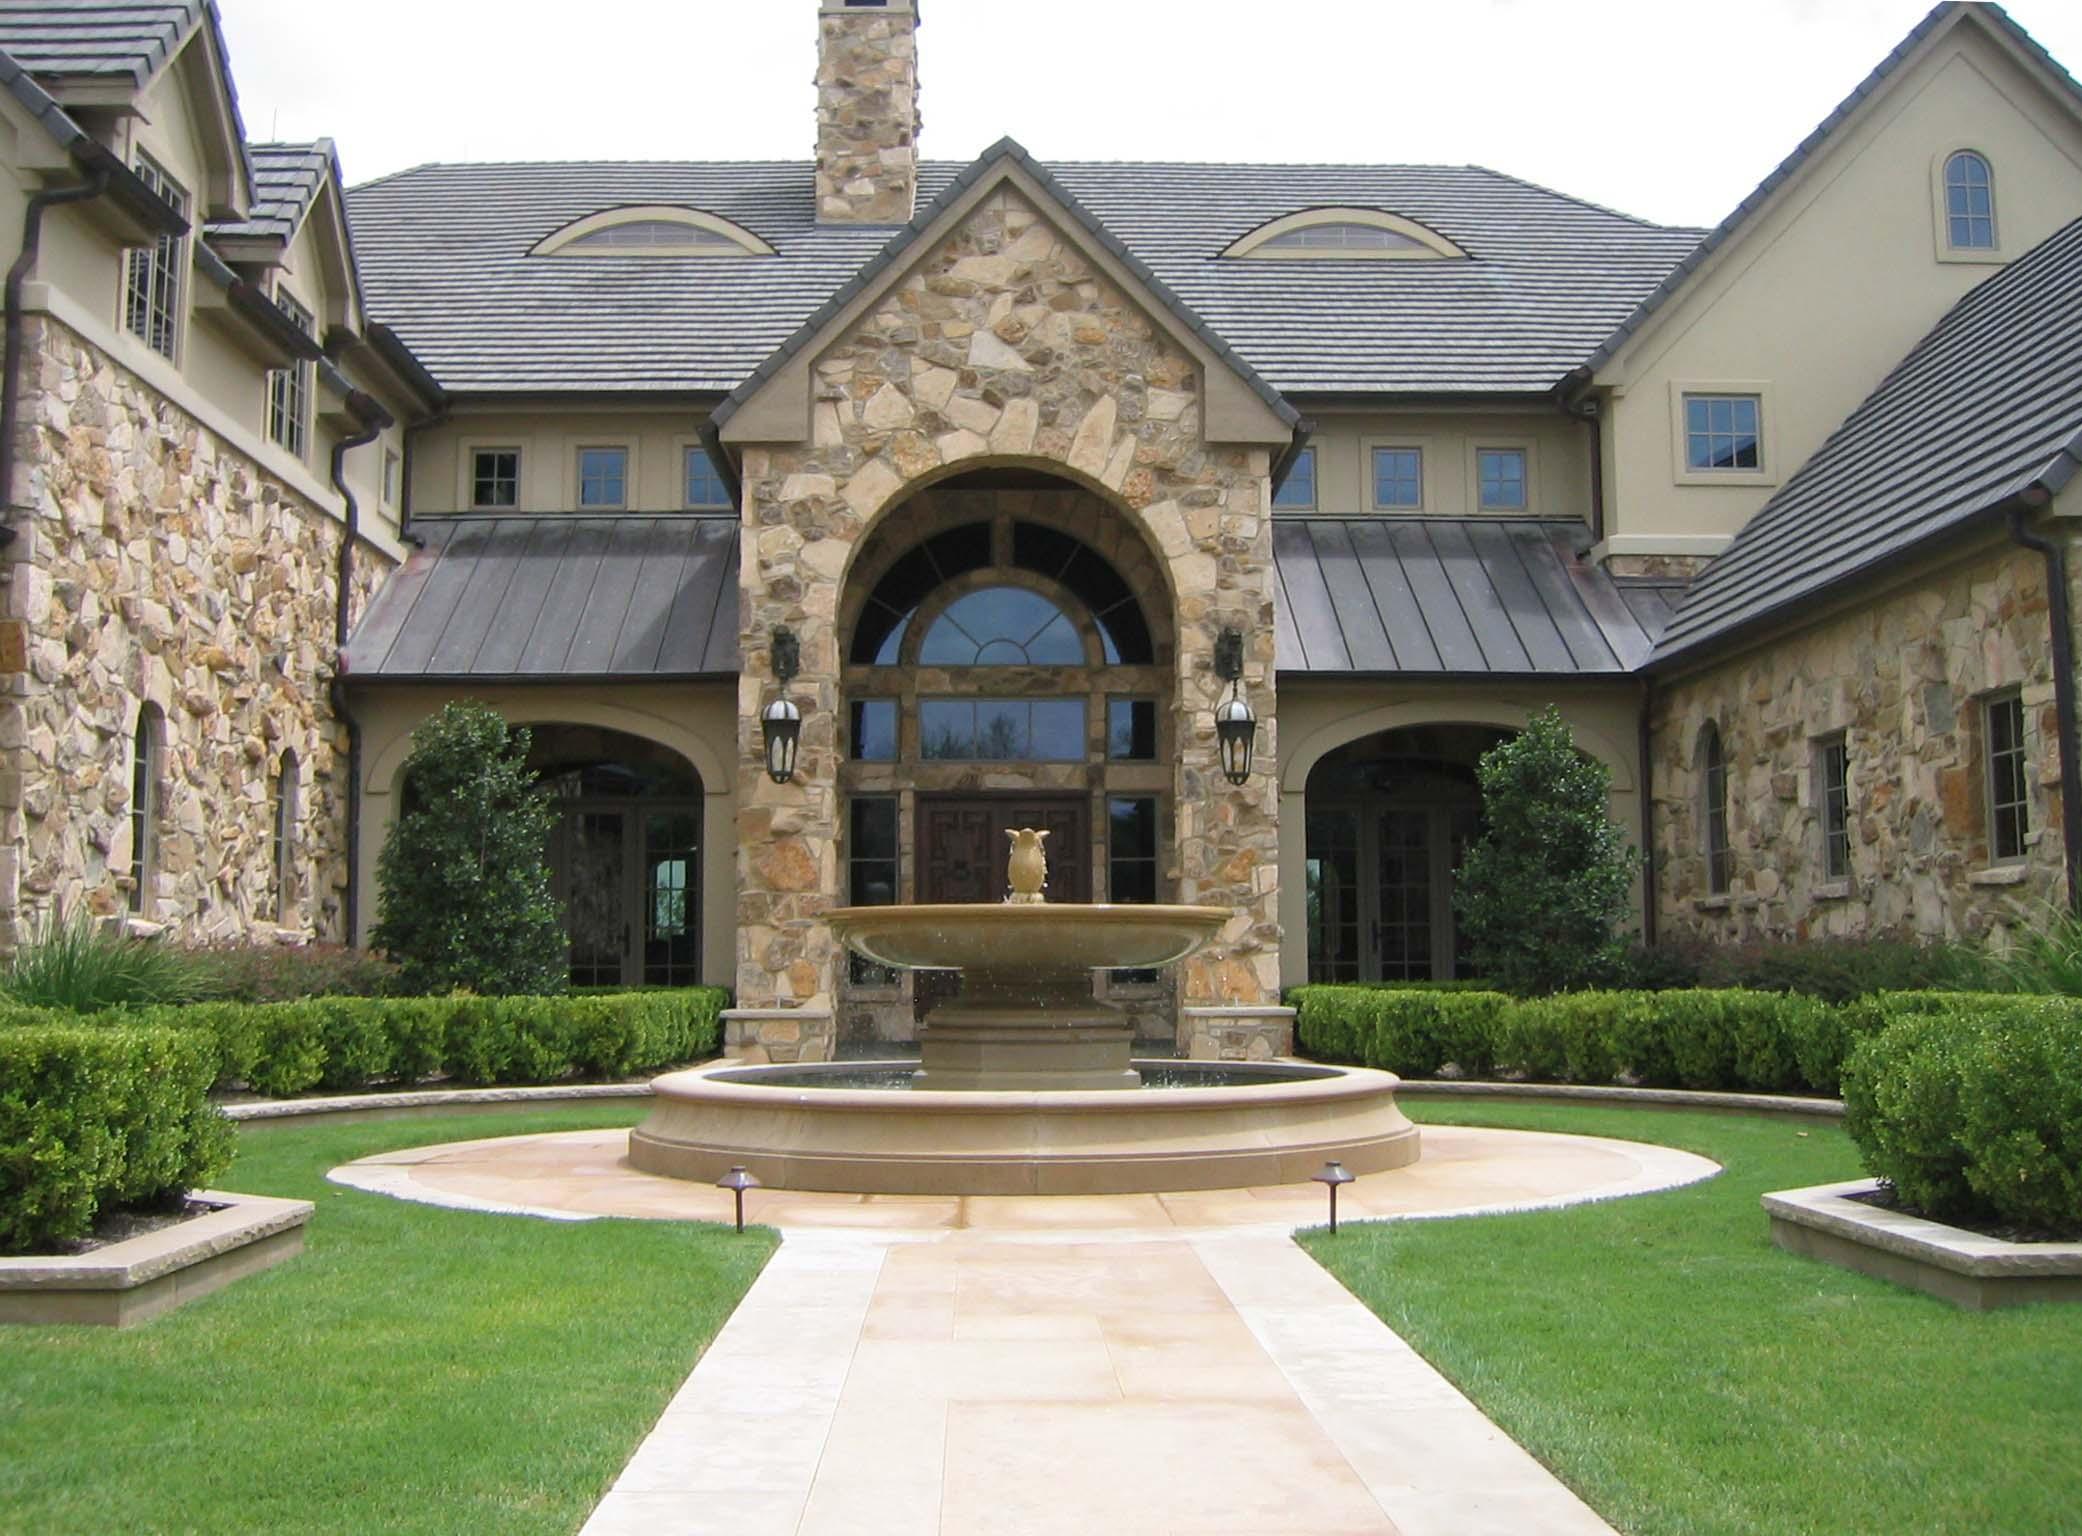 Escala Residence Entry Fountain - comp.jpg